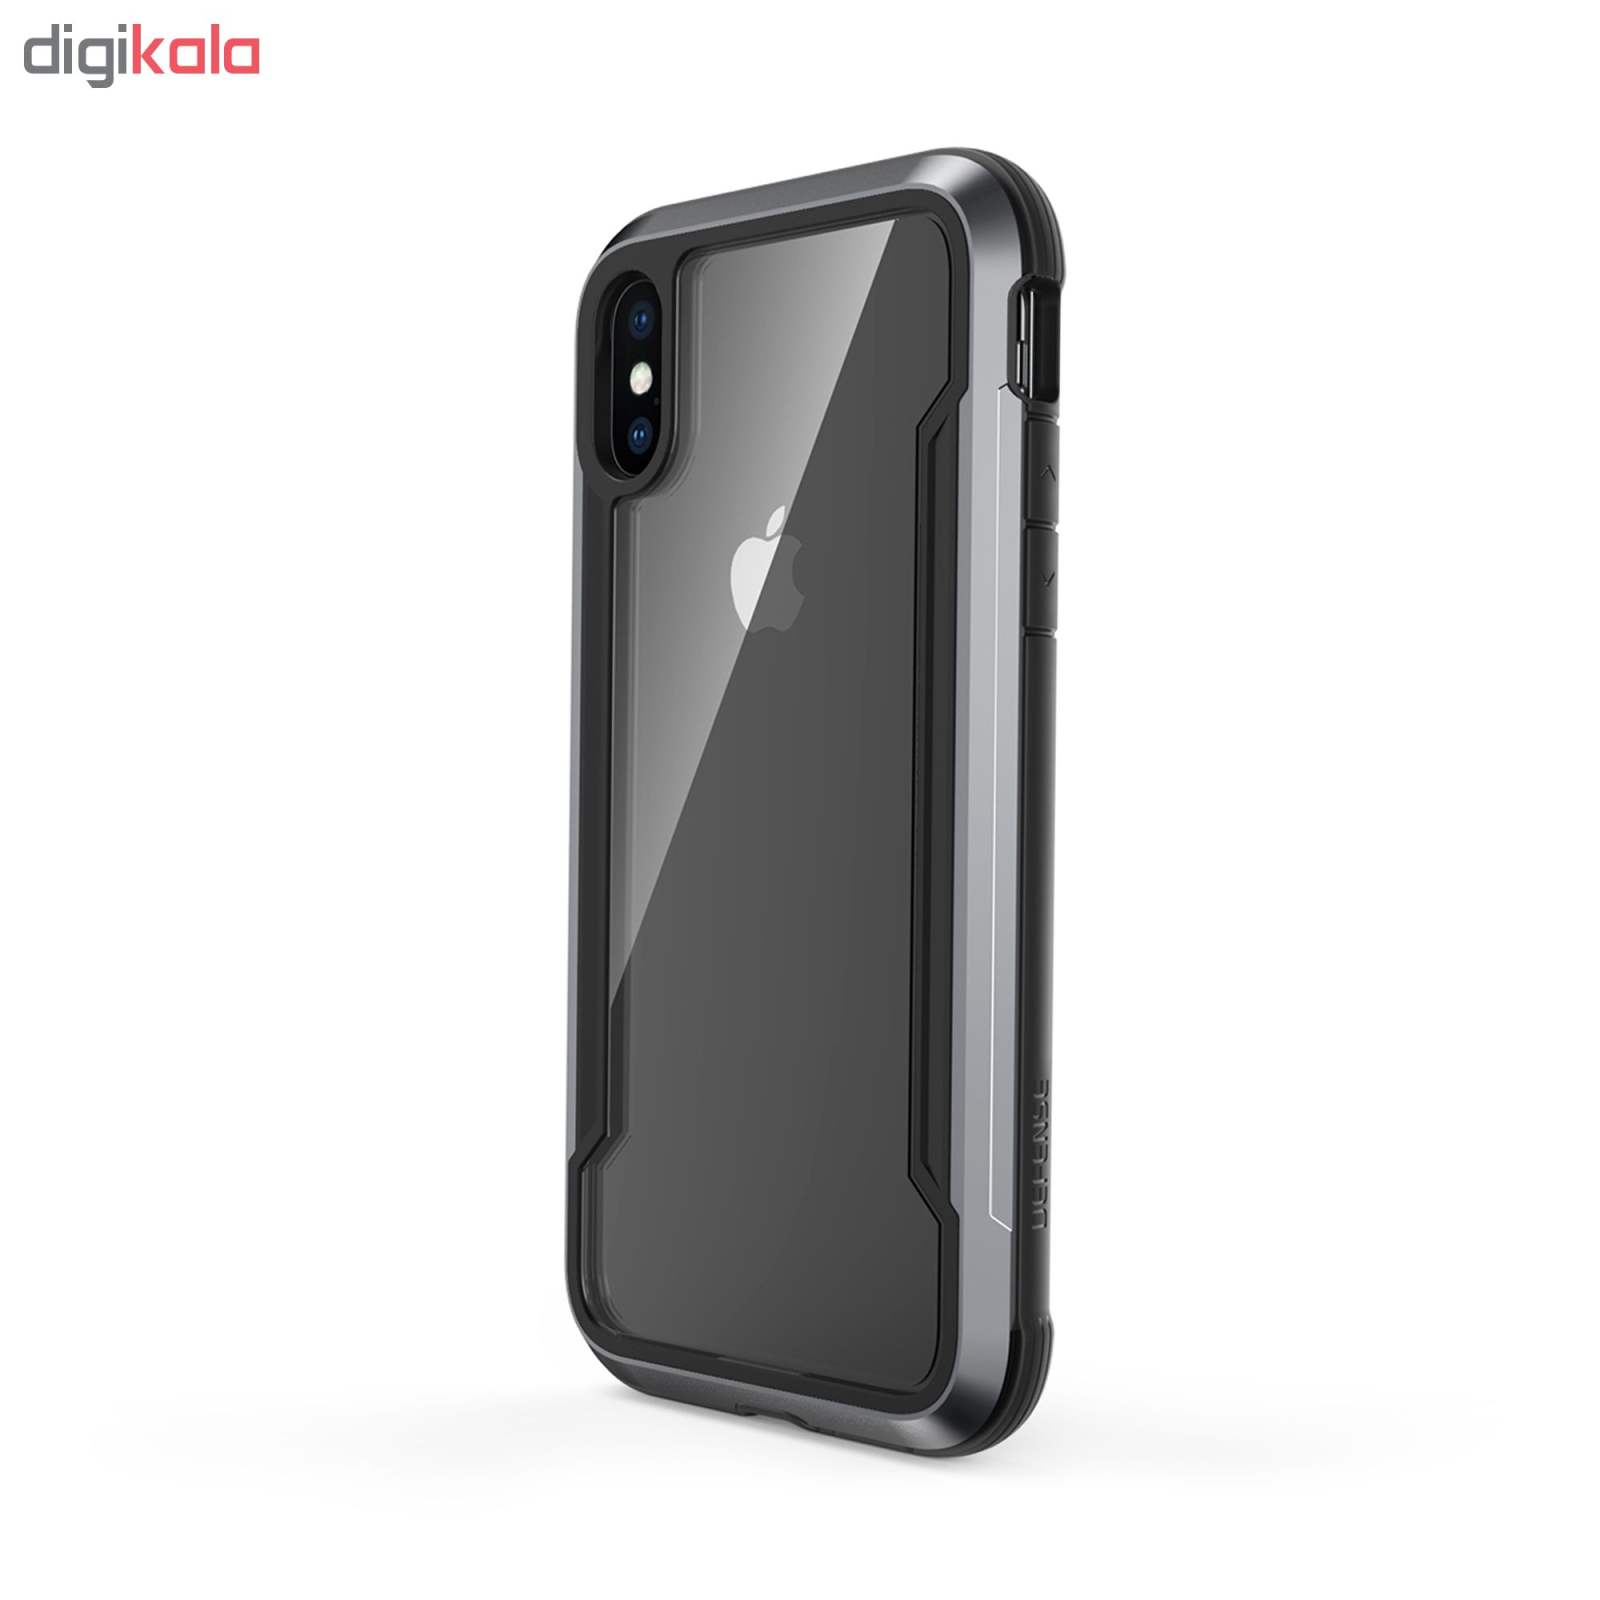 کاور ایکس دوریا مدل Defense Shield مناسب برای گوشی موبایل اپل IPhone Xs Max main 1 1